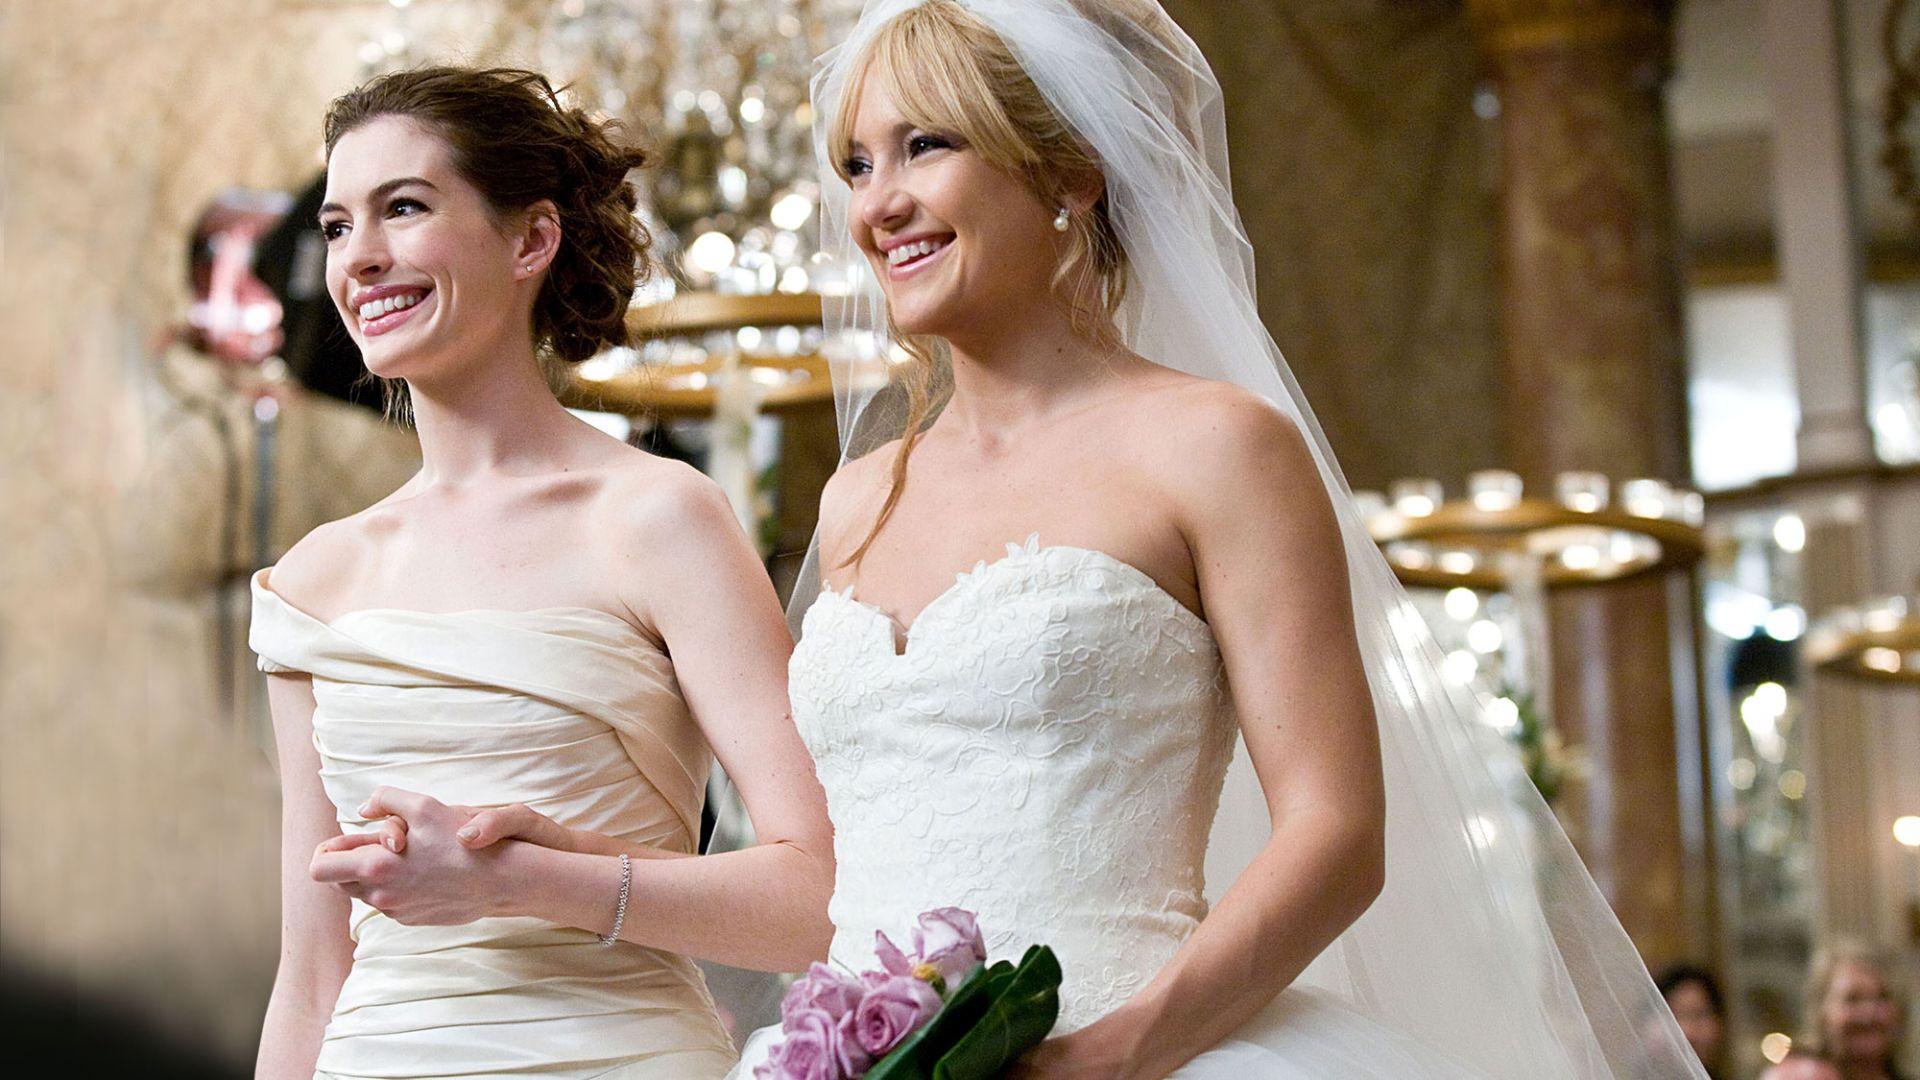 the best movie wedding dresses best wedding dresses